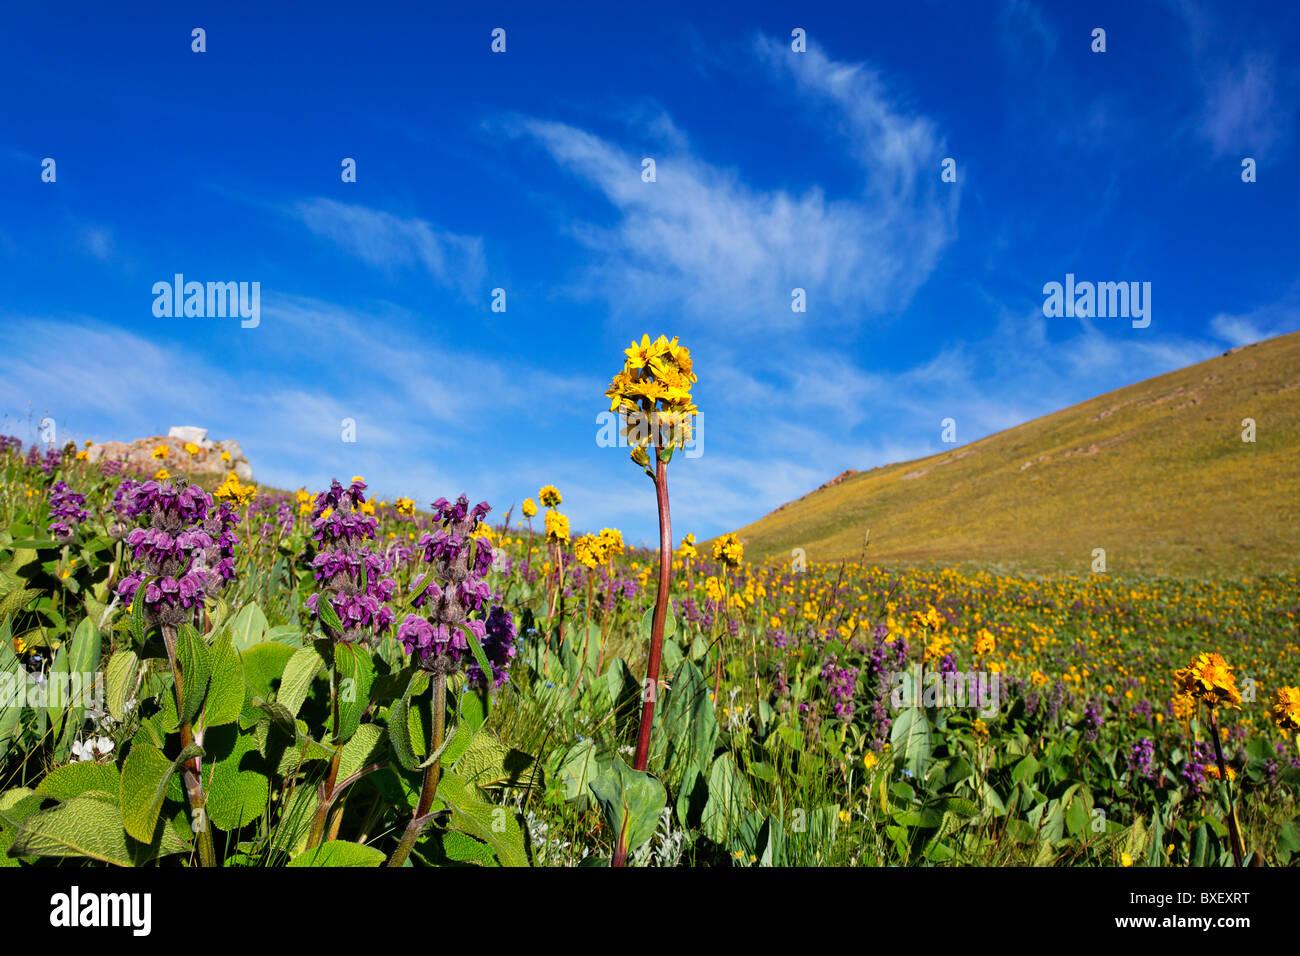 Kyrgyzstan - Lake Song Kul - summer flowers beside Lake Song Kul - Stock Image